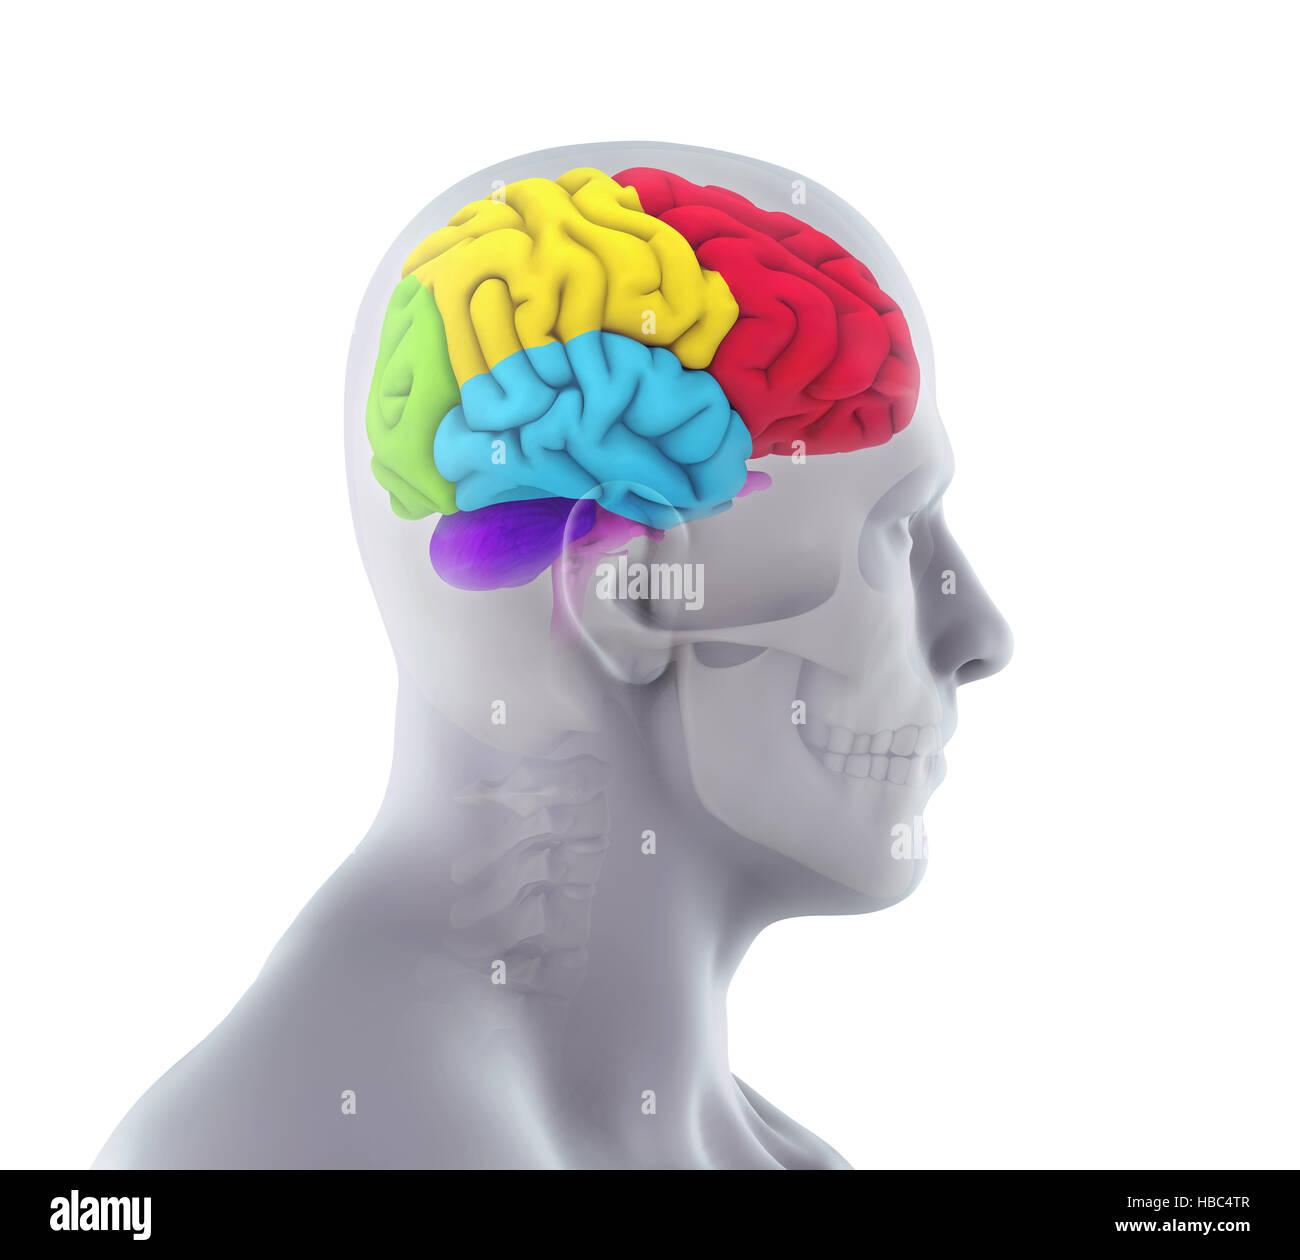 Mri Of Head Trauma Stockfotos & Mri Of Head Trauma Bilder - Alamy